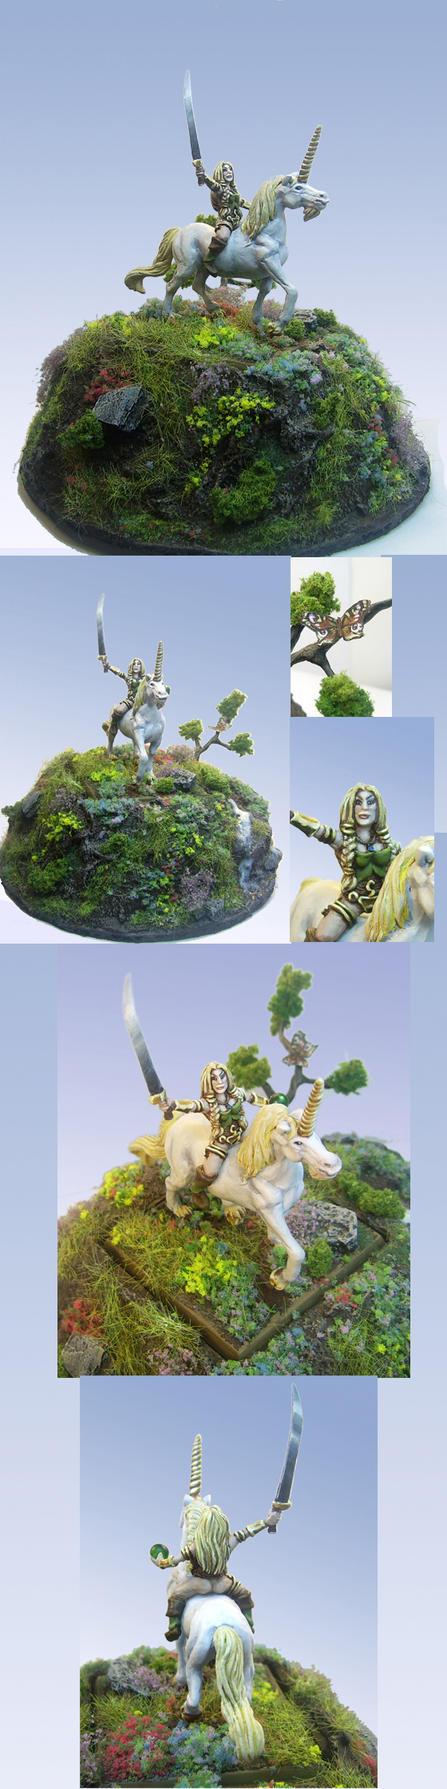 Girl on Unicorn mini sculpt by Morhin